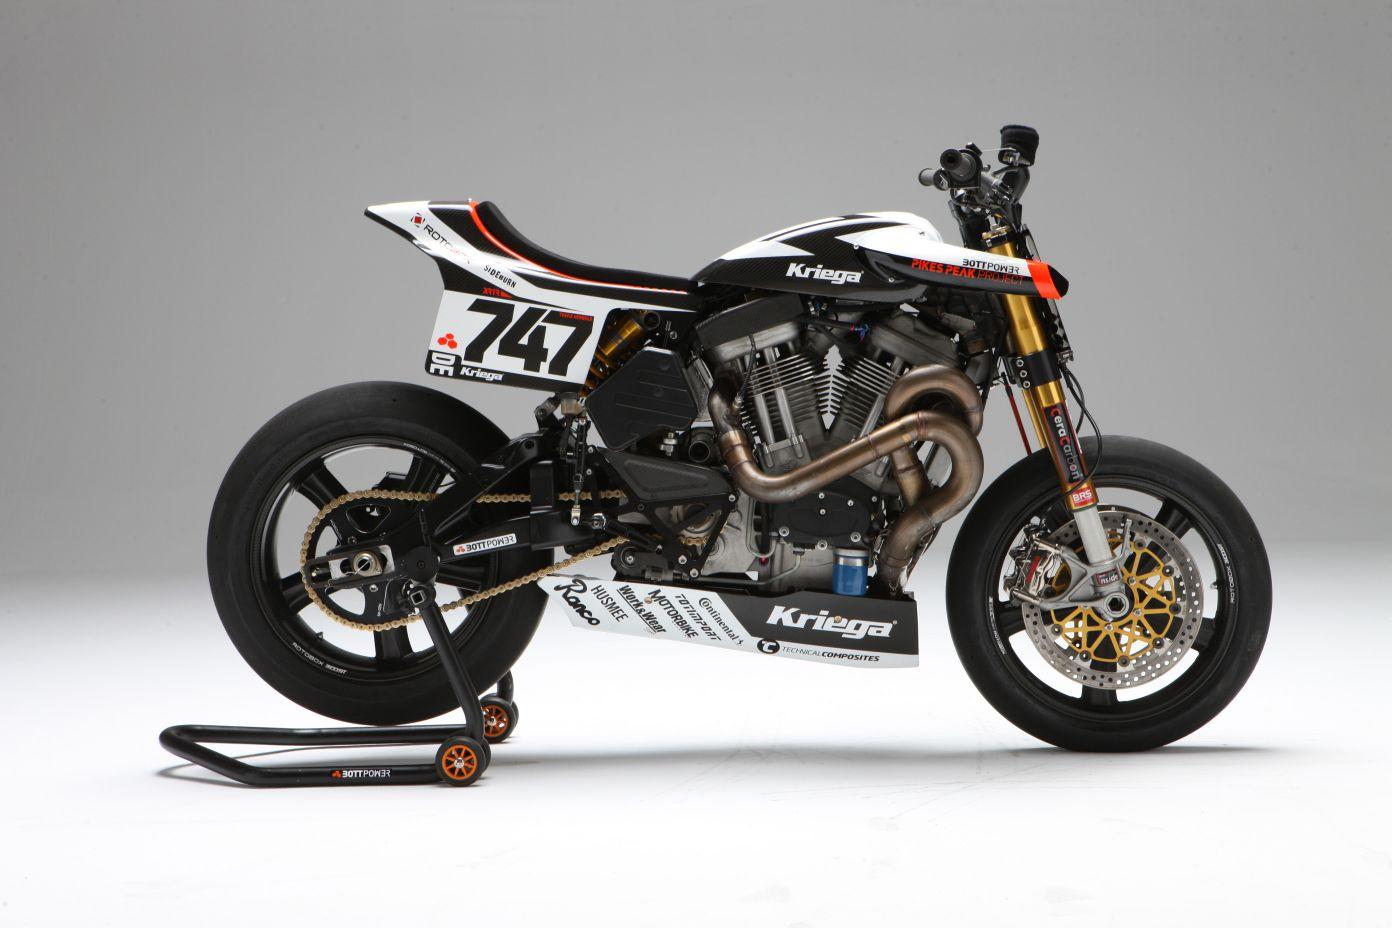 ROTOBOX(ロトボックス) カーボンホイールセット BOOST (ブースト) Harley-Davidson  Touring StreetGlide/RoadGlide